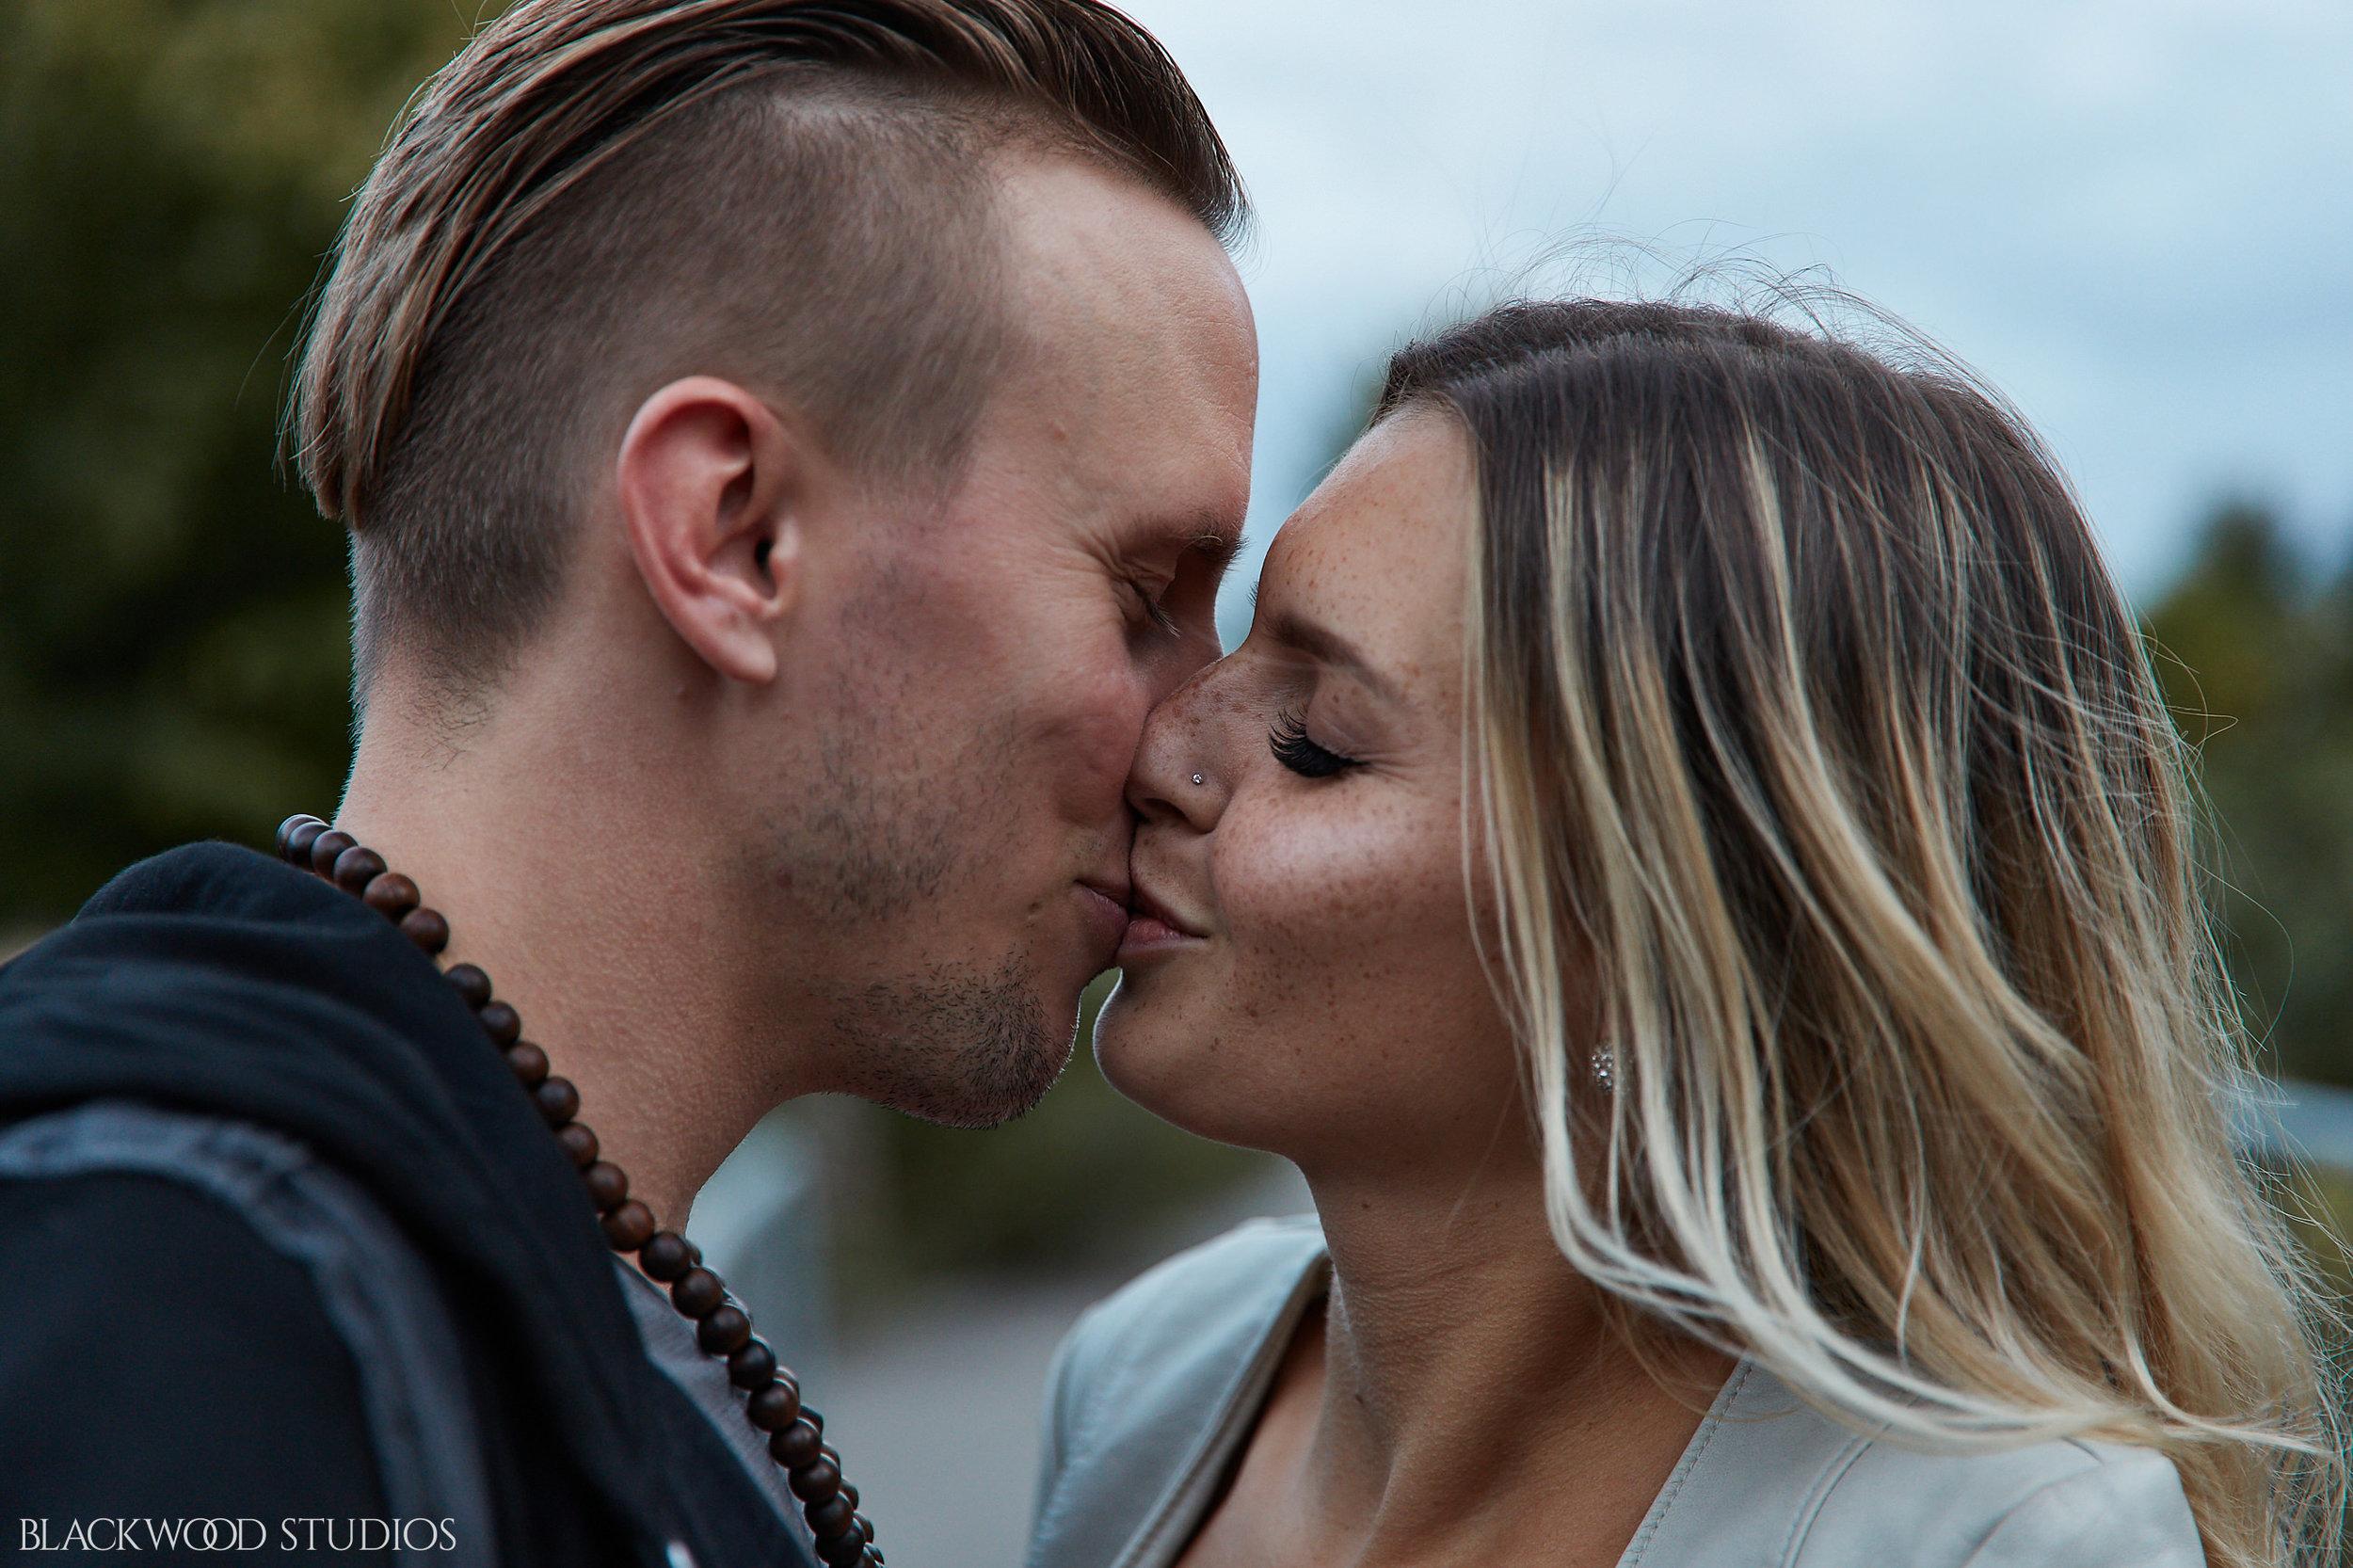 Blackwood-Studios-20181012-182503-Aleisha-and-Brad-Engagement-photography-Toronto-Ontario-Canada-Corktown-Common.jpg